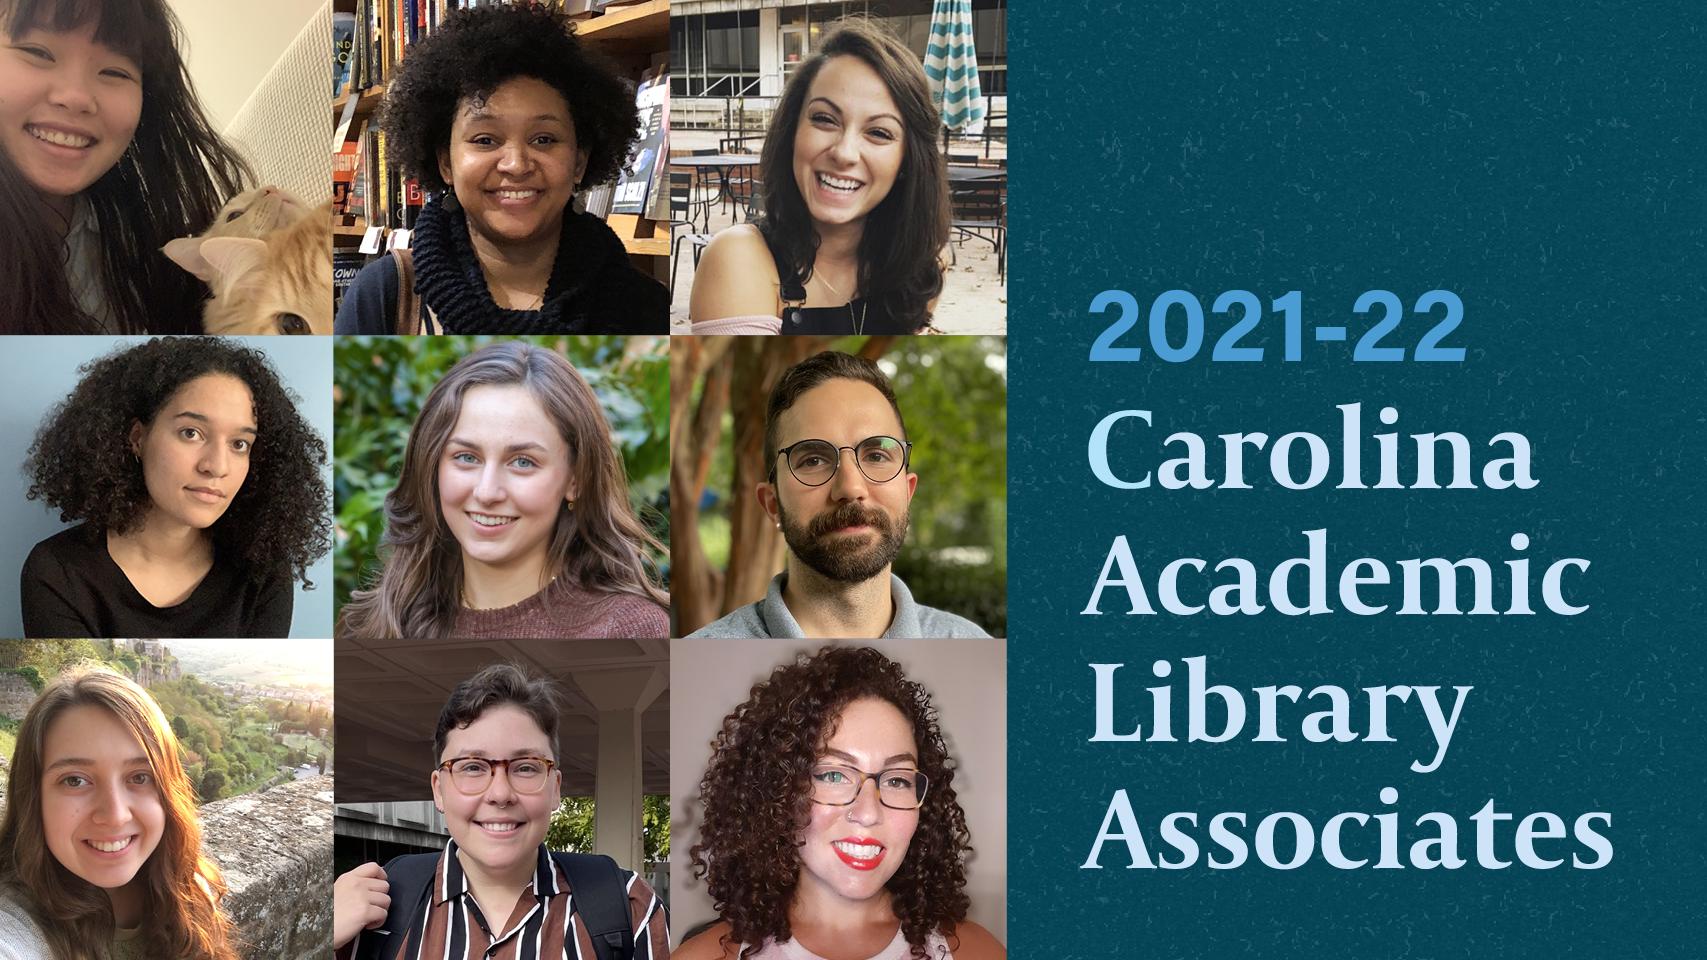 Welcome, 2021-22 Carolina Academic Library Associates